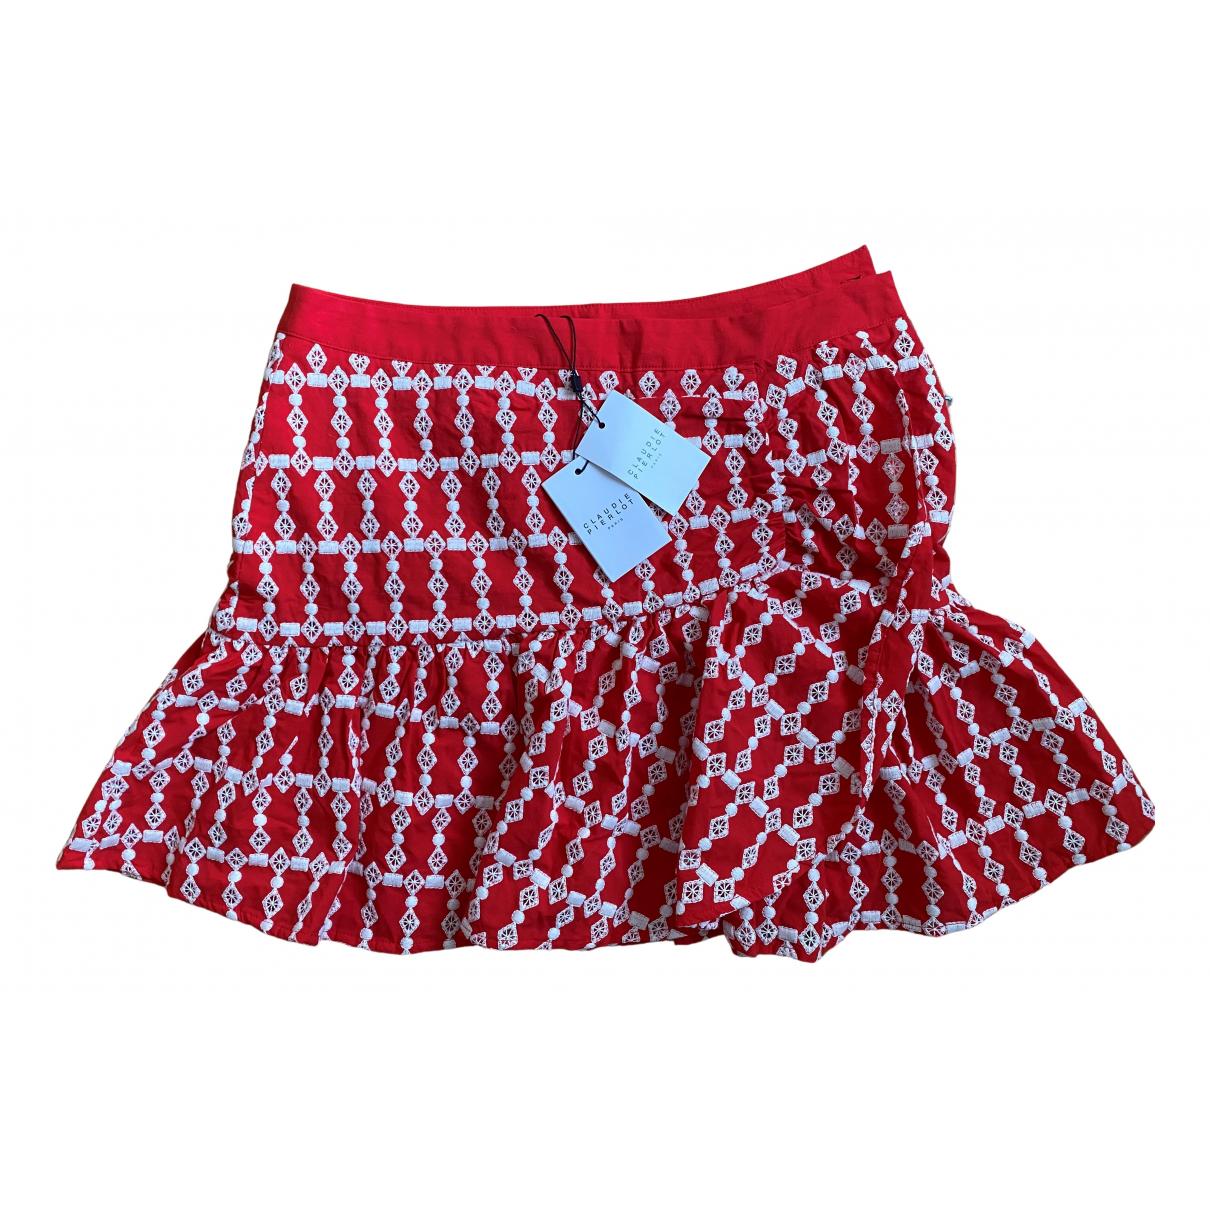 Claudie Pierlot Spring Summer 2020 Red Cotton skirt for Women 36 FR